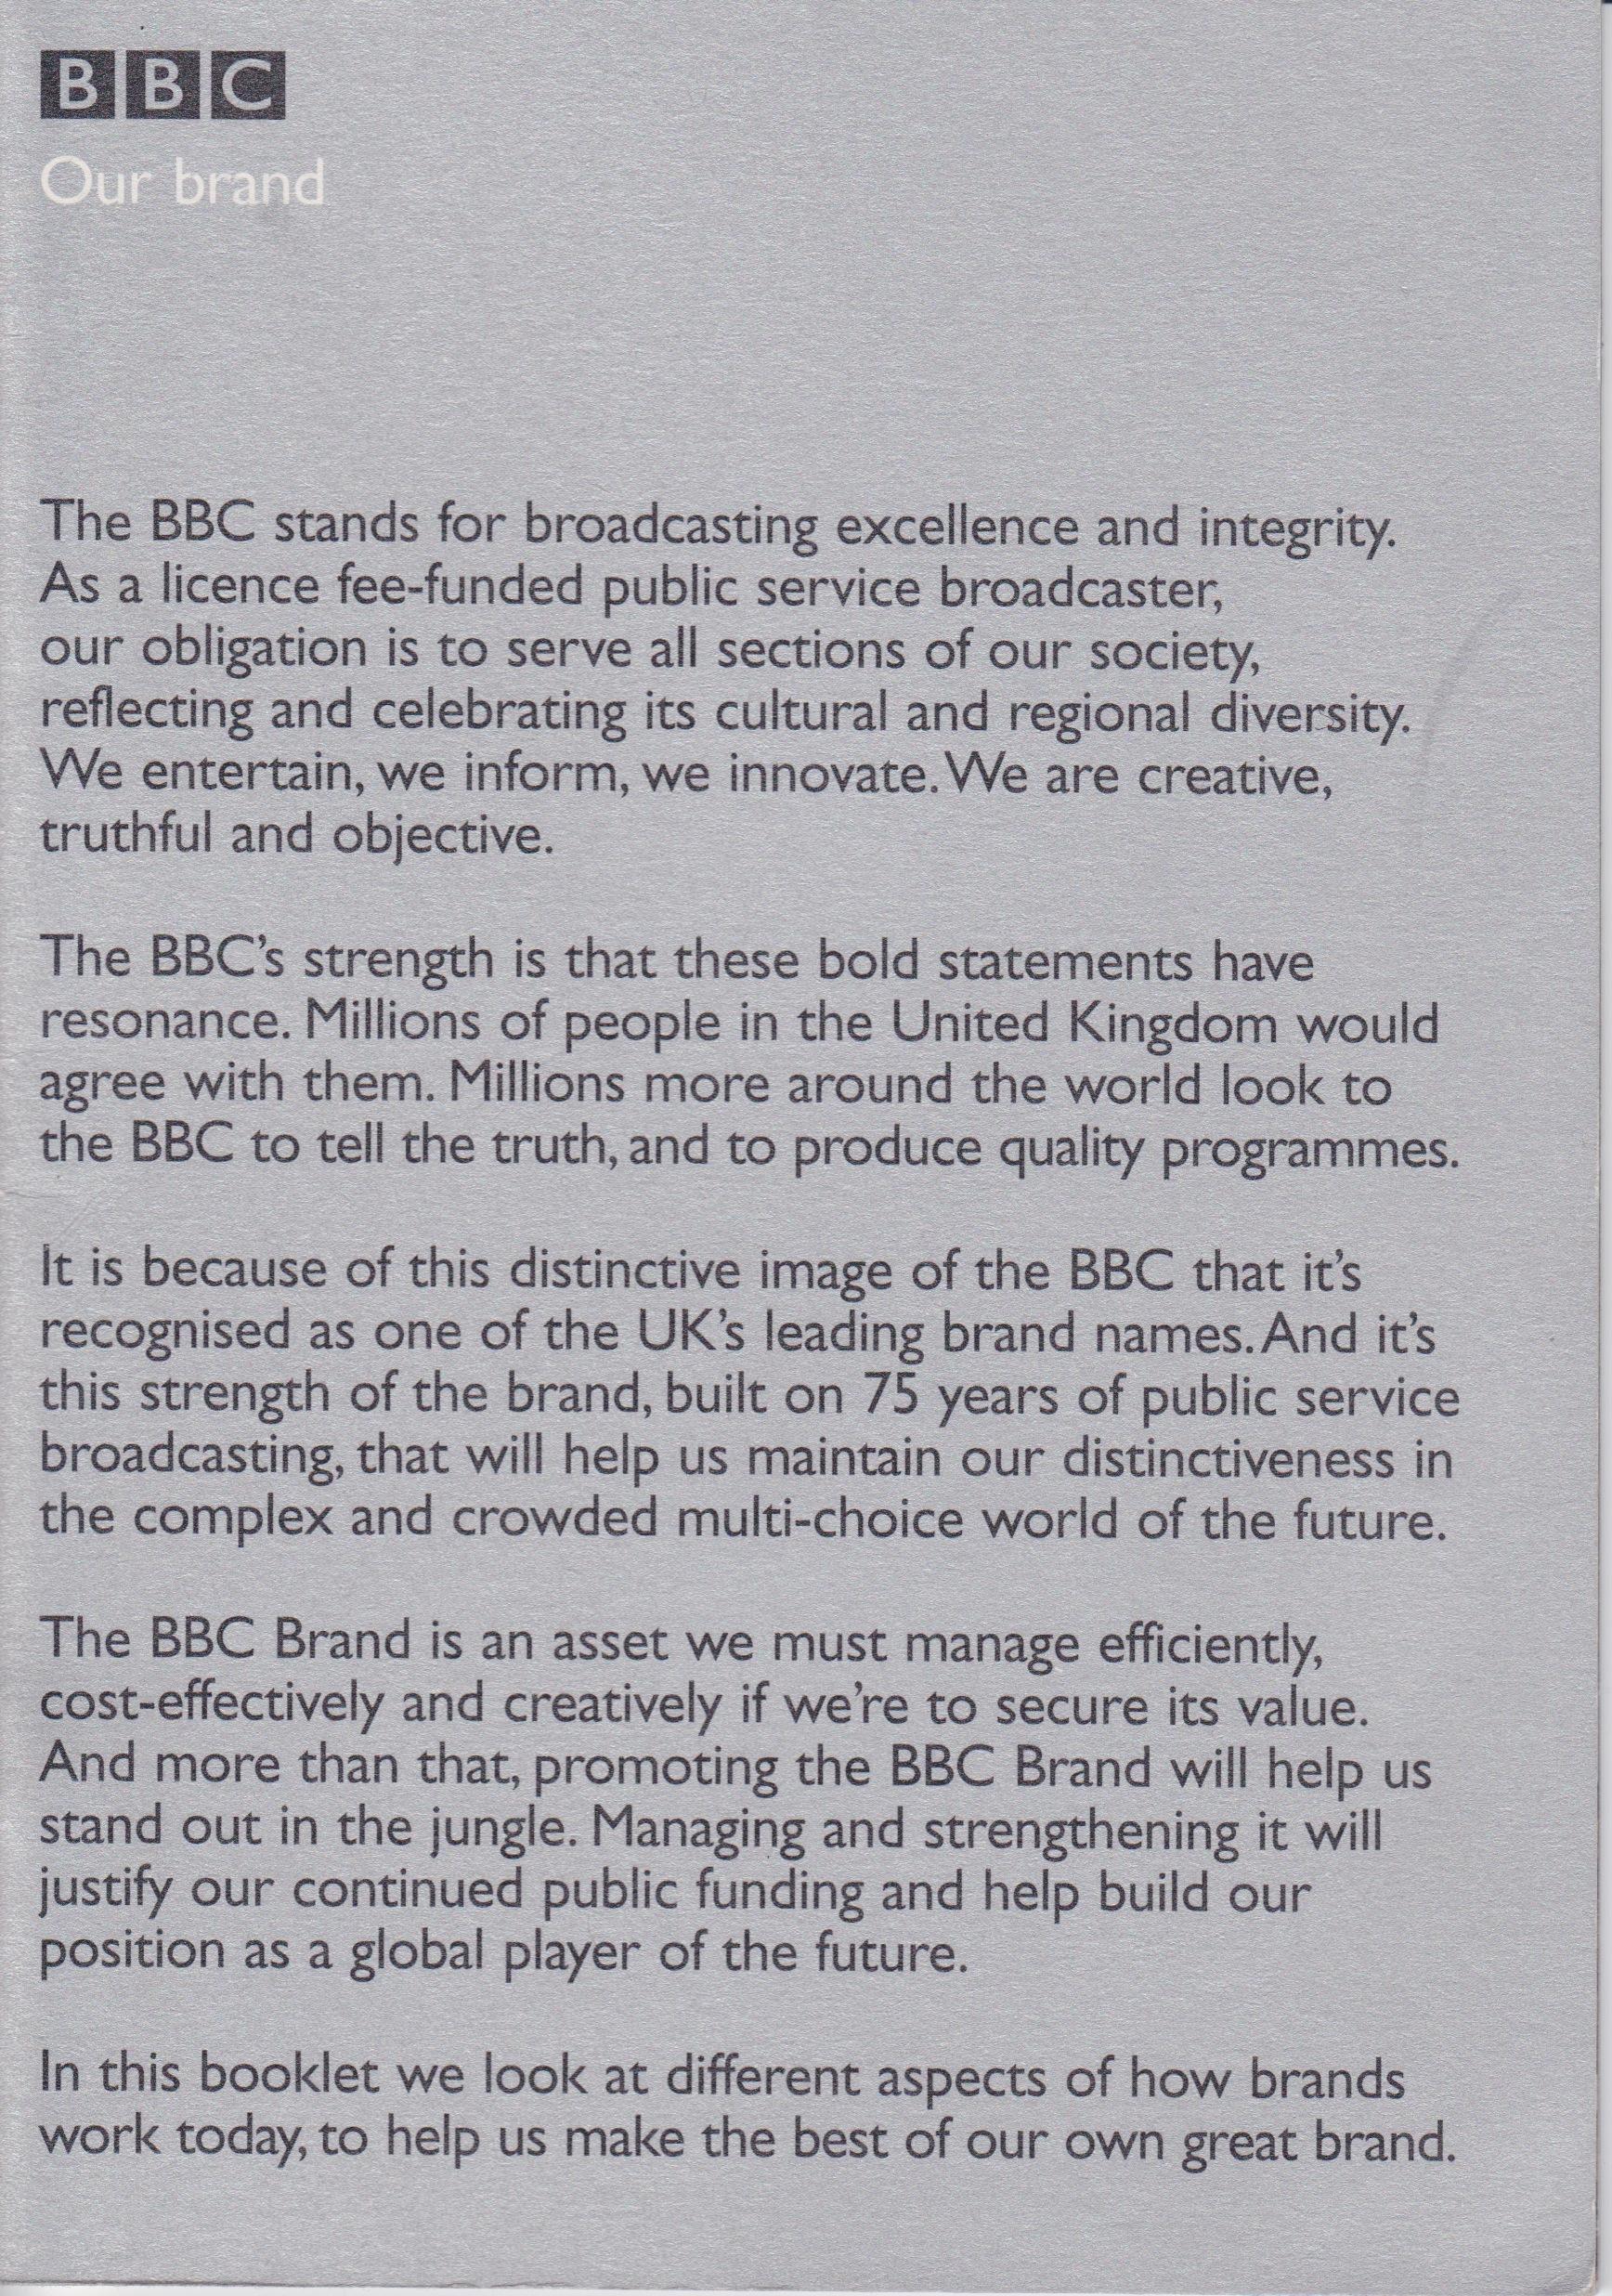 BBC Our Brand